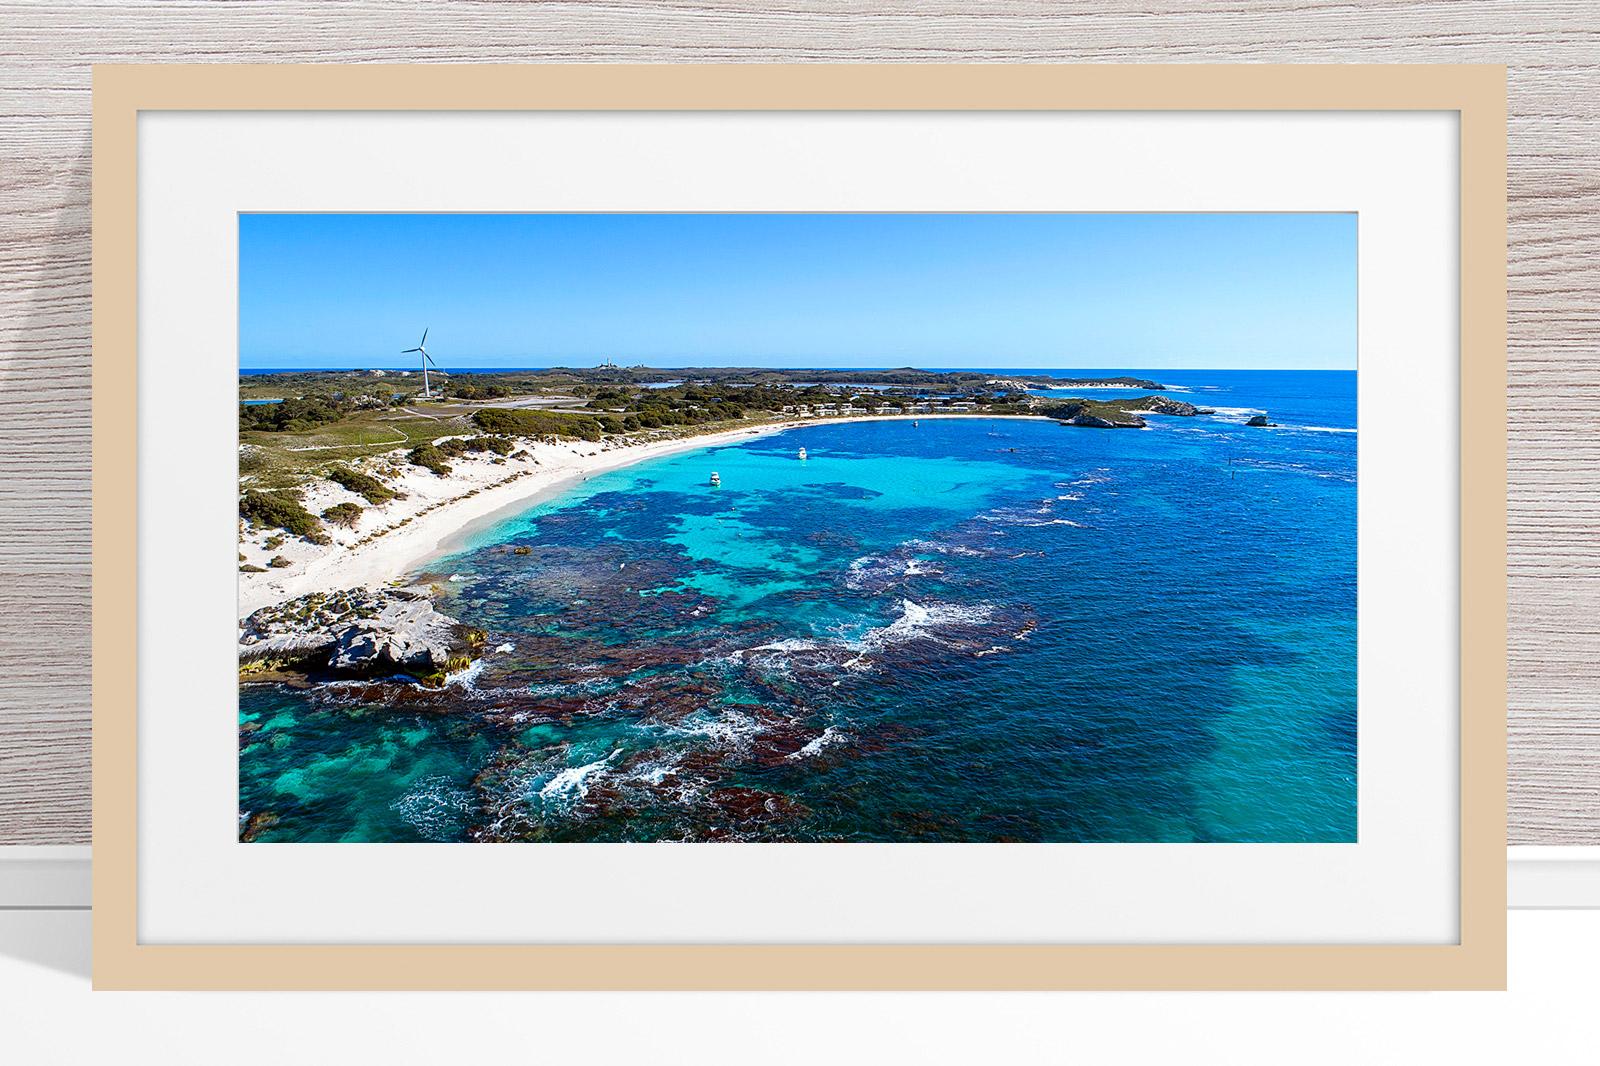 Jason Mazur - 'Longreach Bay, Rottnest' 063 Light Frame